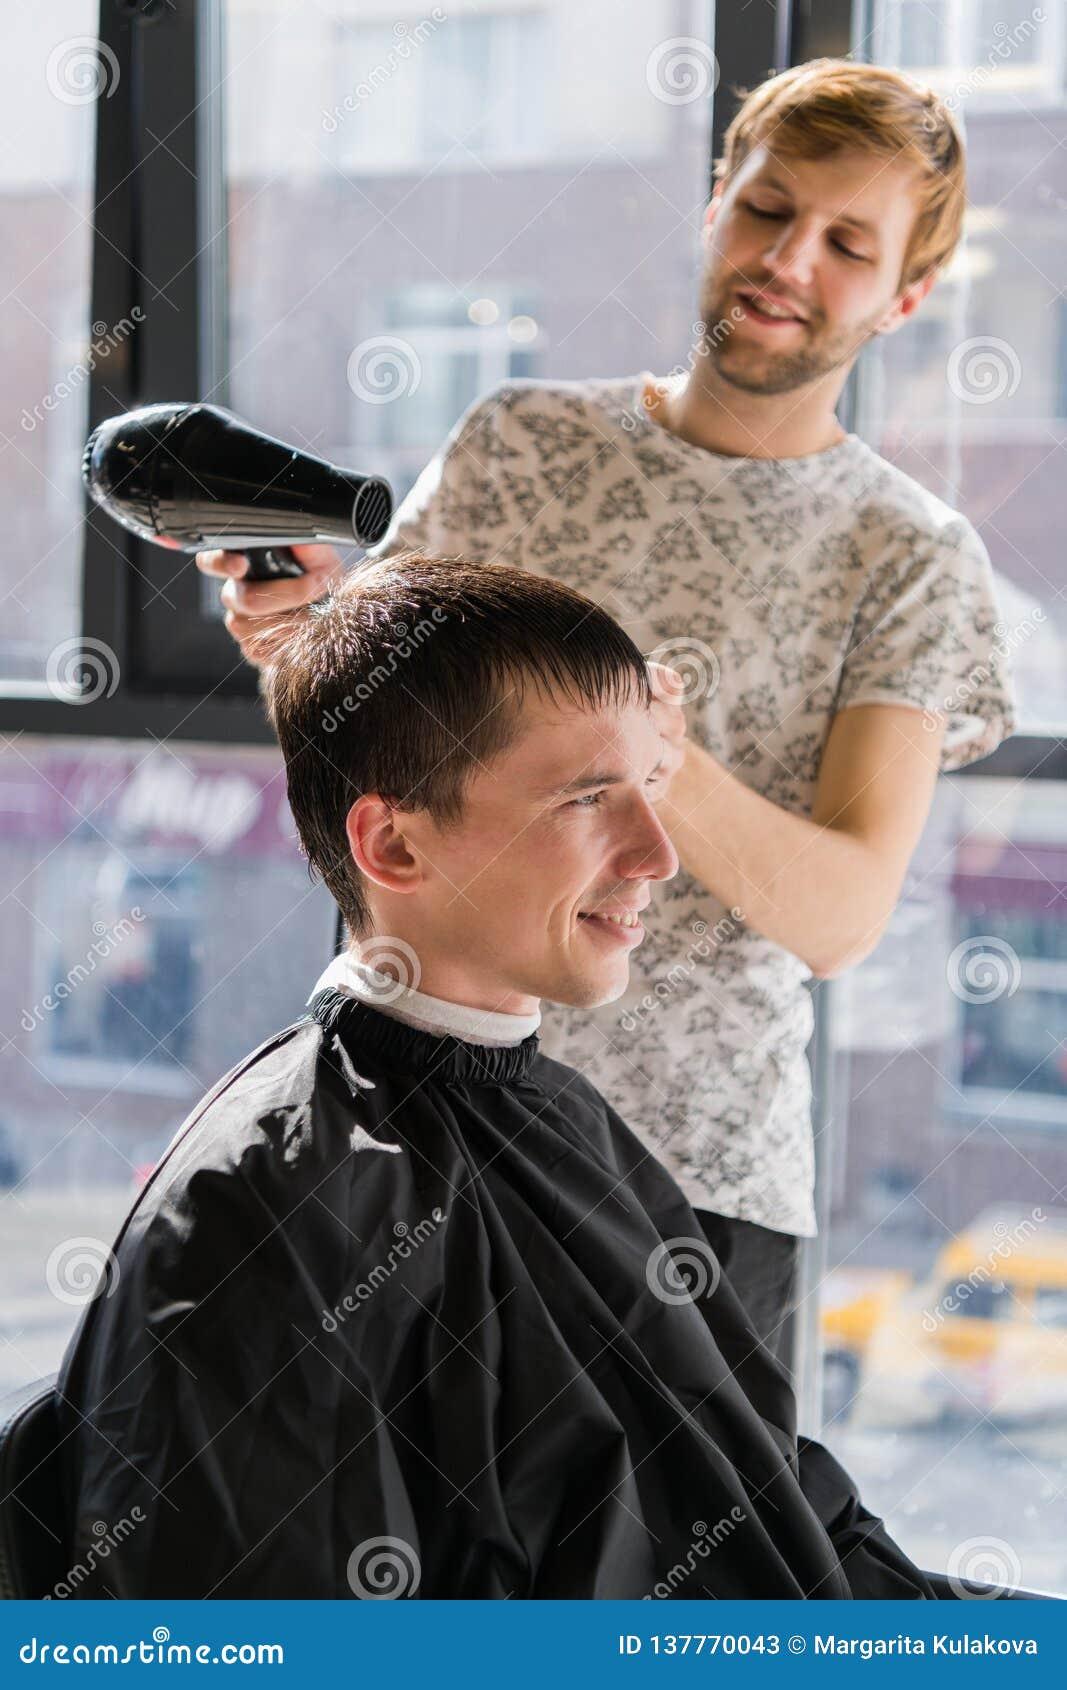 Indivíduo novo na barbearia, cabeleireiro do moderno que corta o cabelo com as tesouras, secando Lugar dos homens do conceito